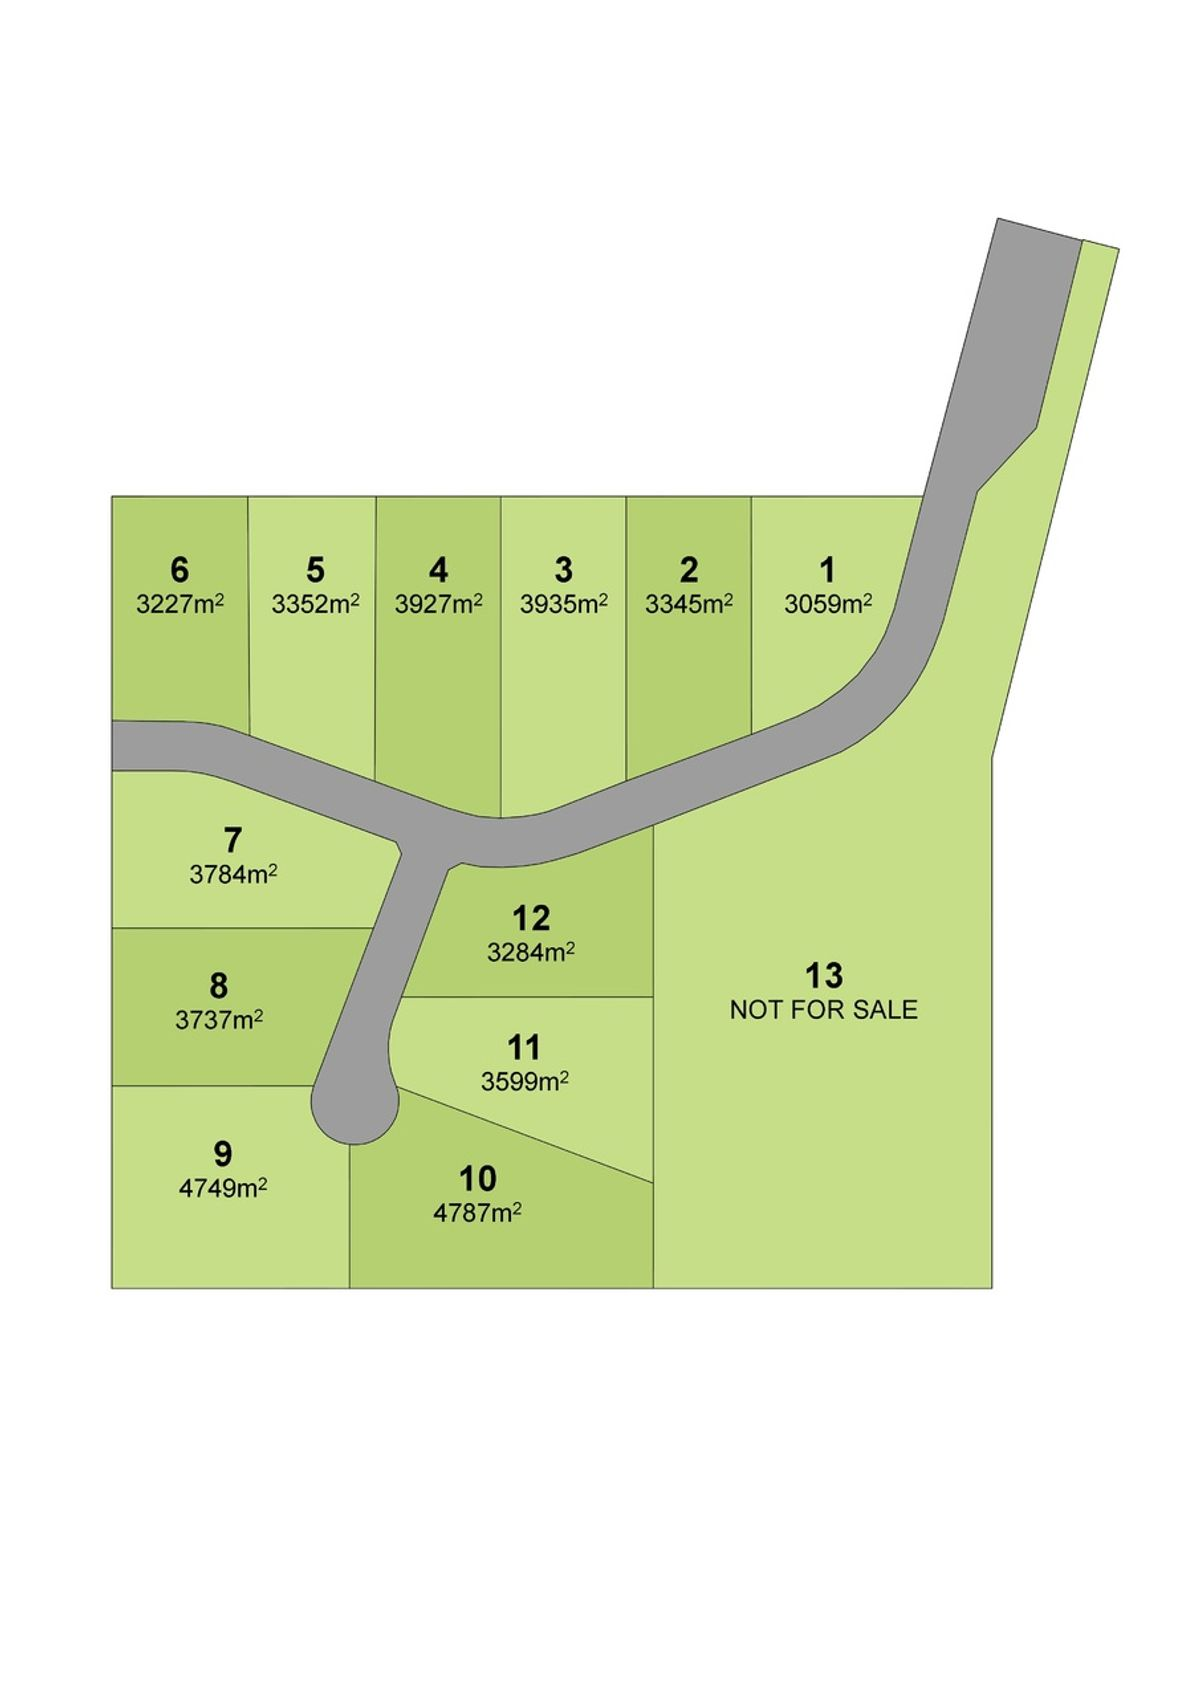 Lot 7 Rowellan Drive, Eagle Point, VIC 3878